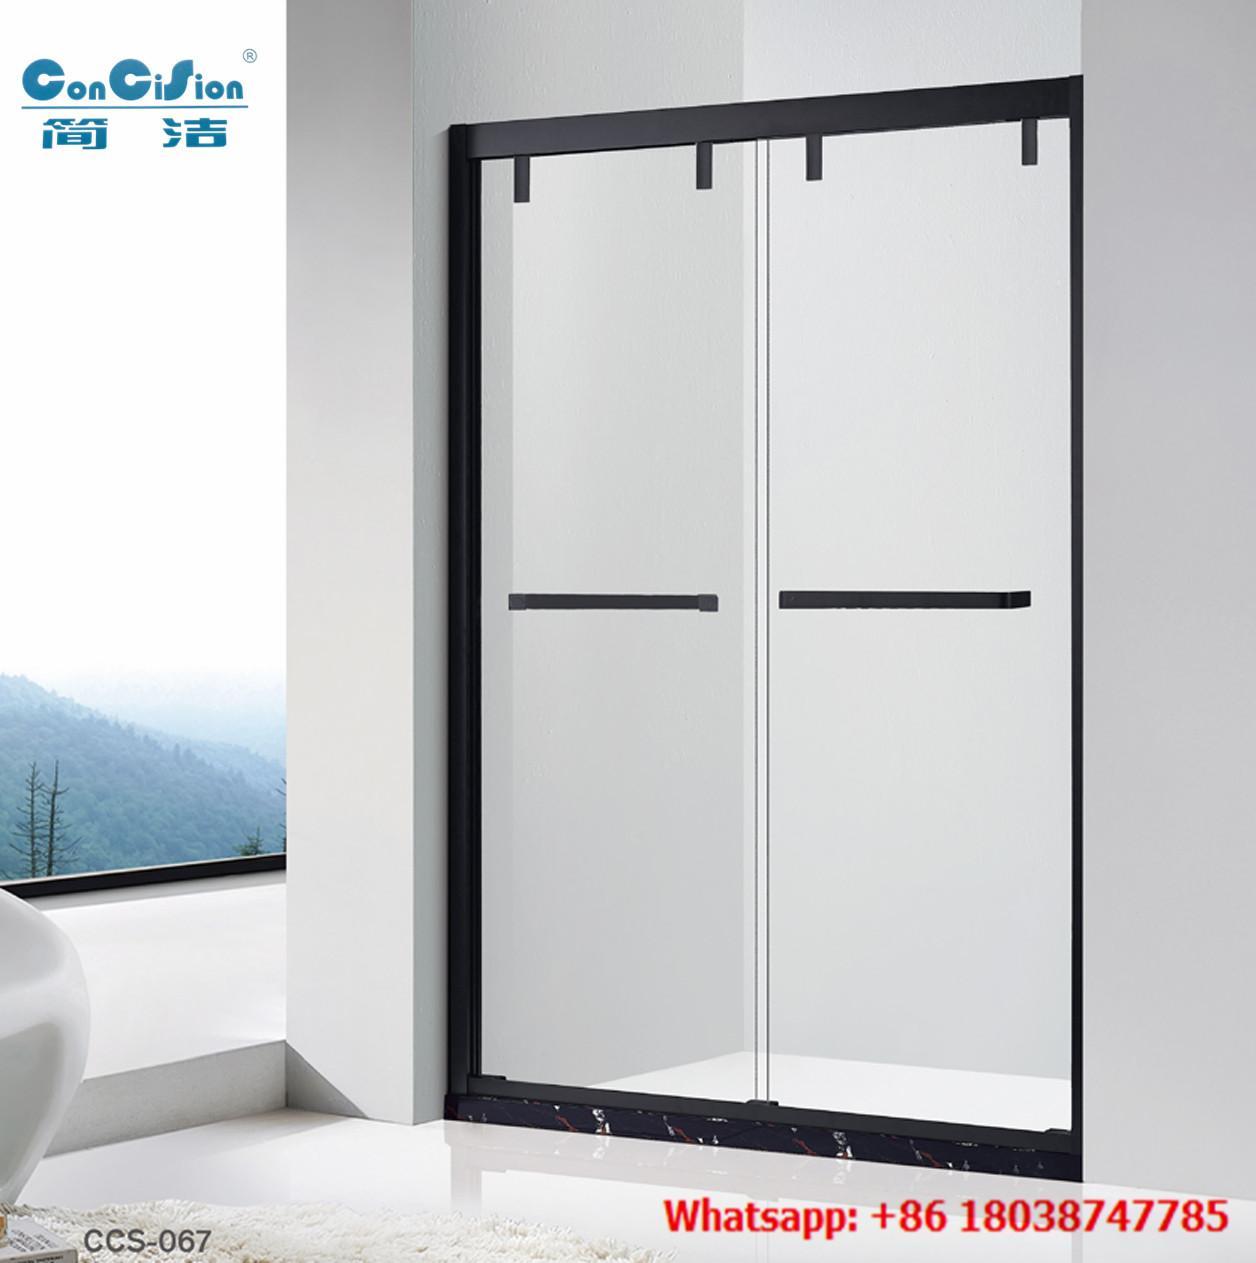 SUS304 Shower door shower screen shower enclosure shower room in black color 1